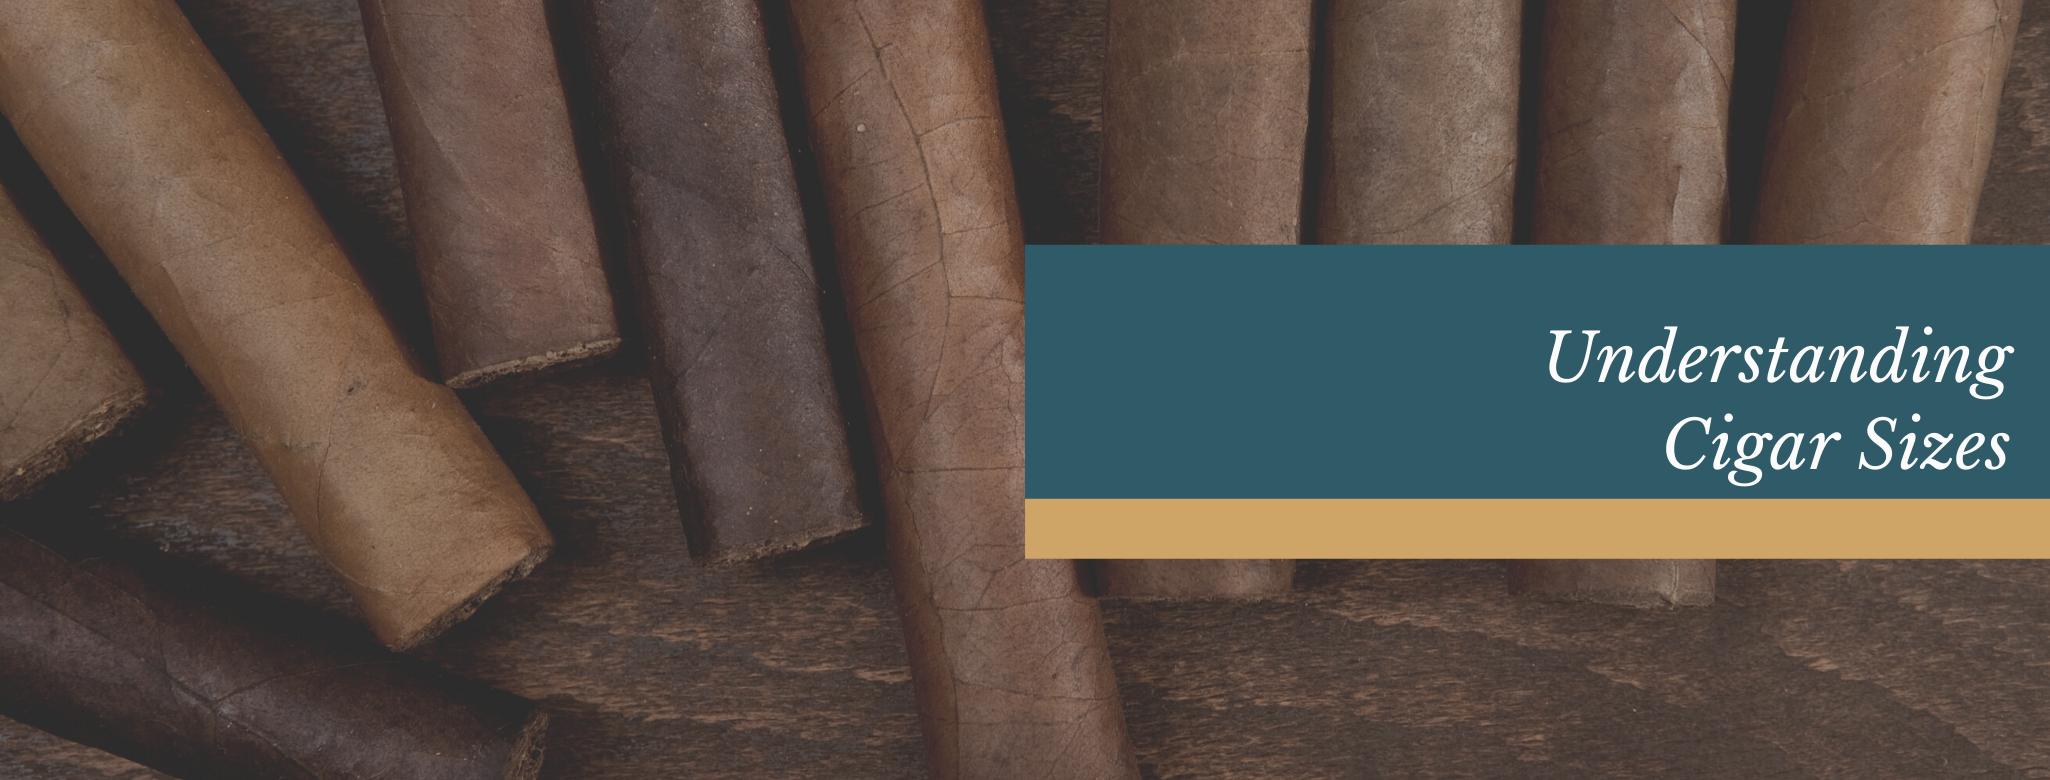 Reads: Understanding Cigar Sizes